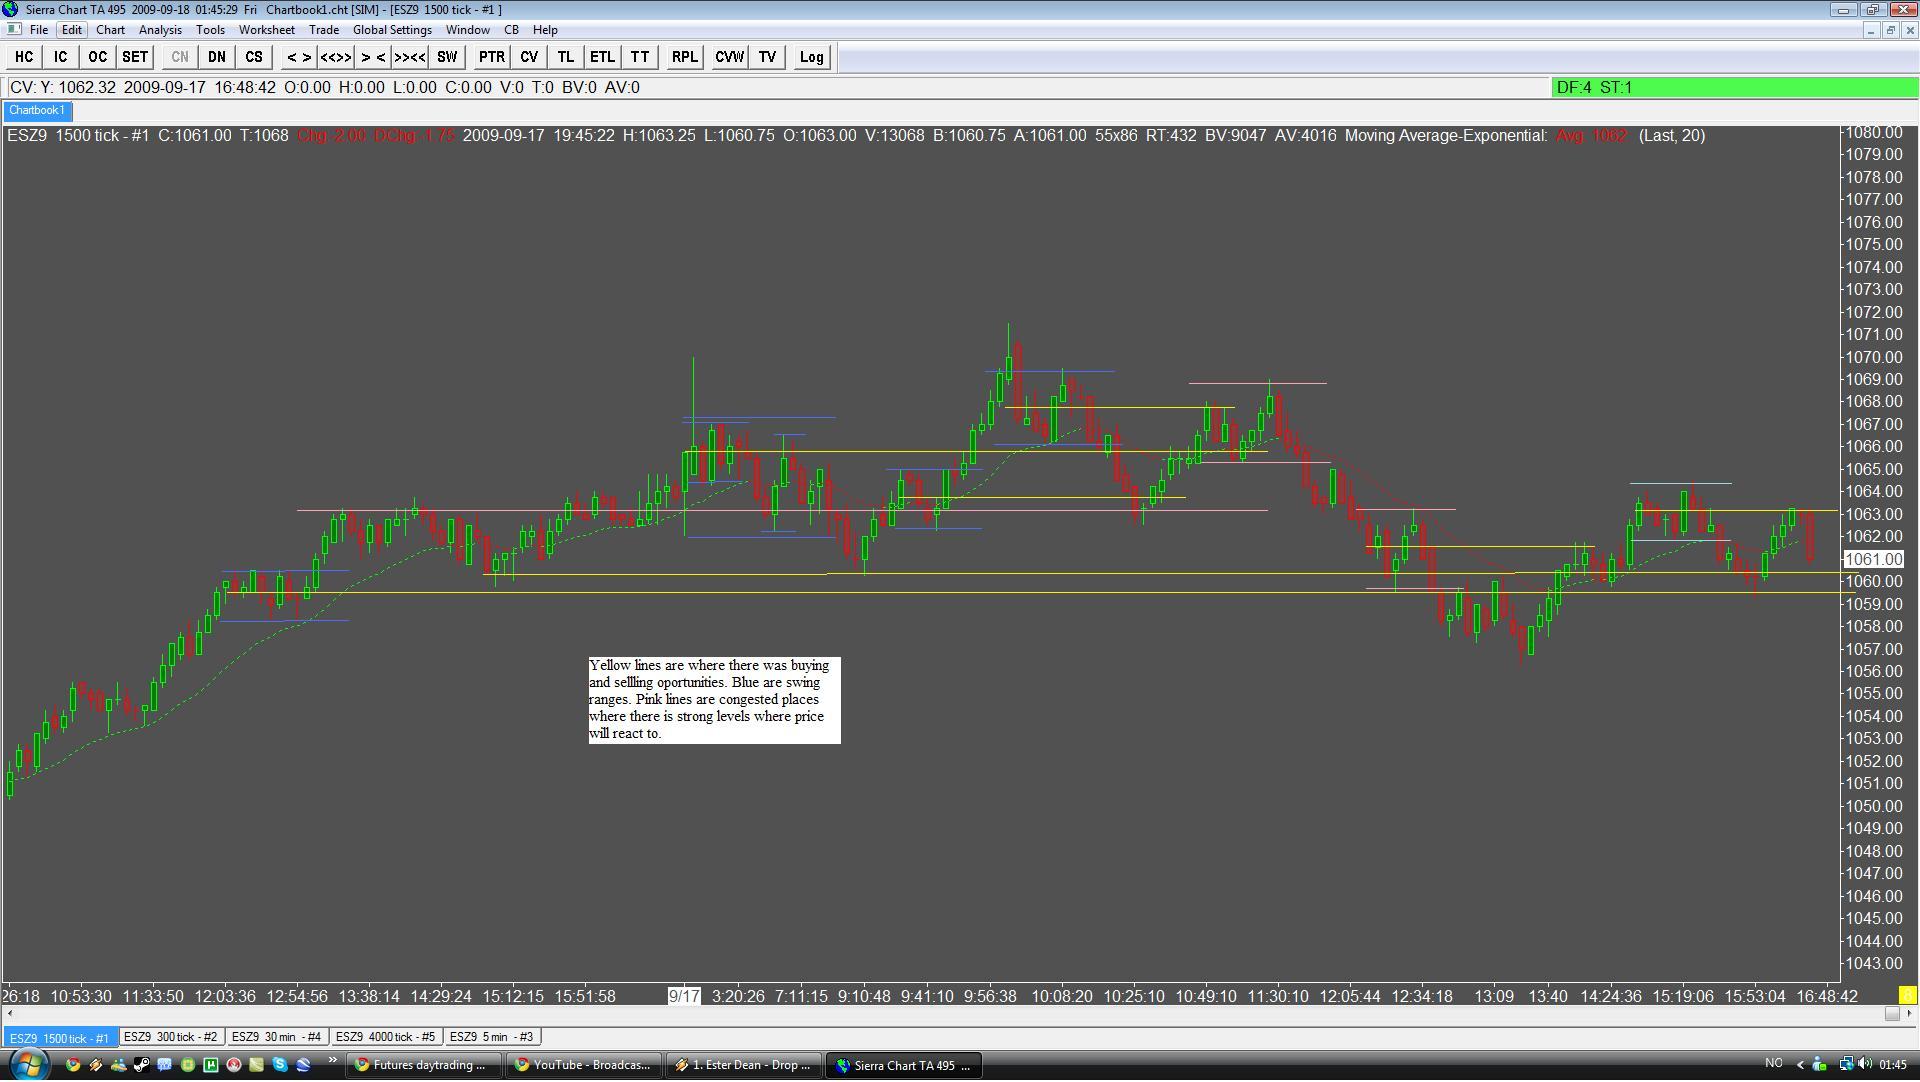 Stock options online p&g